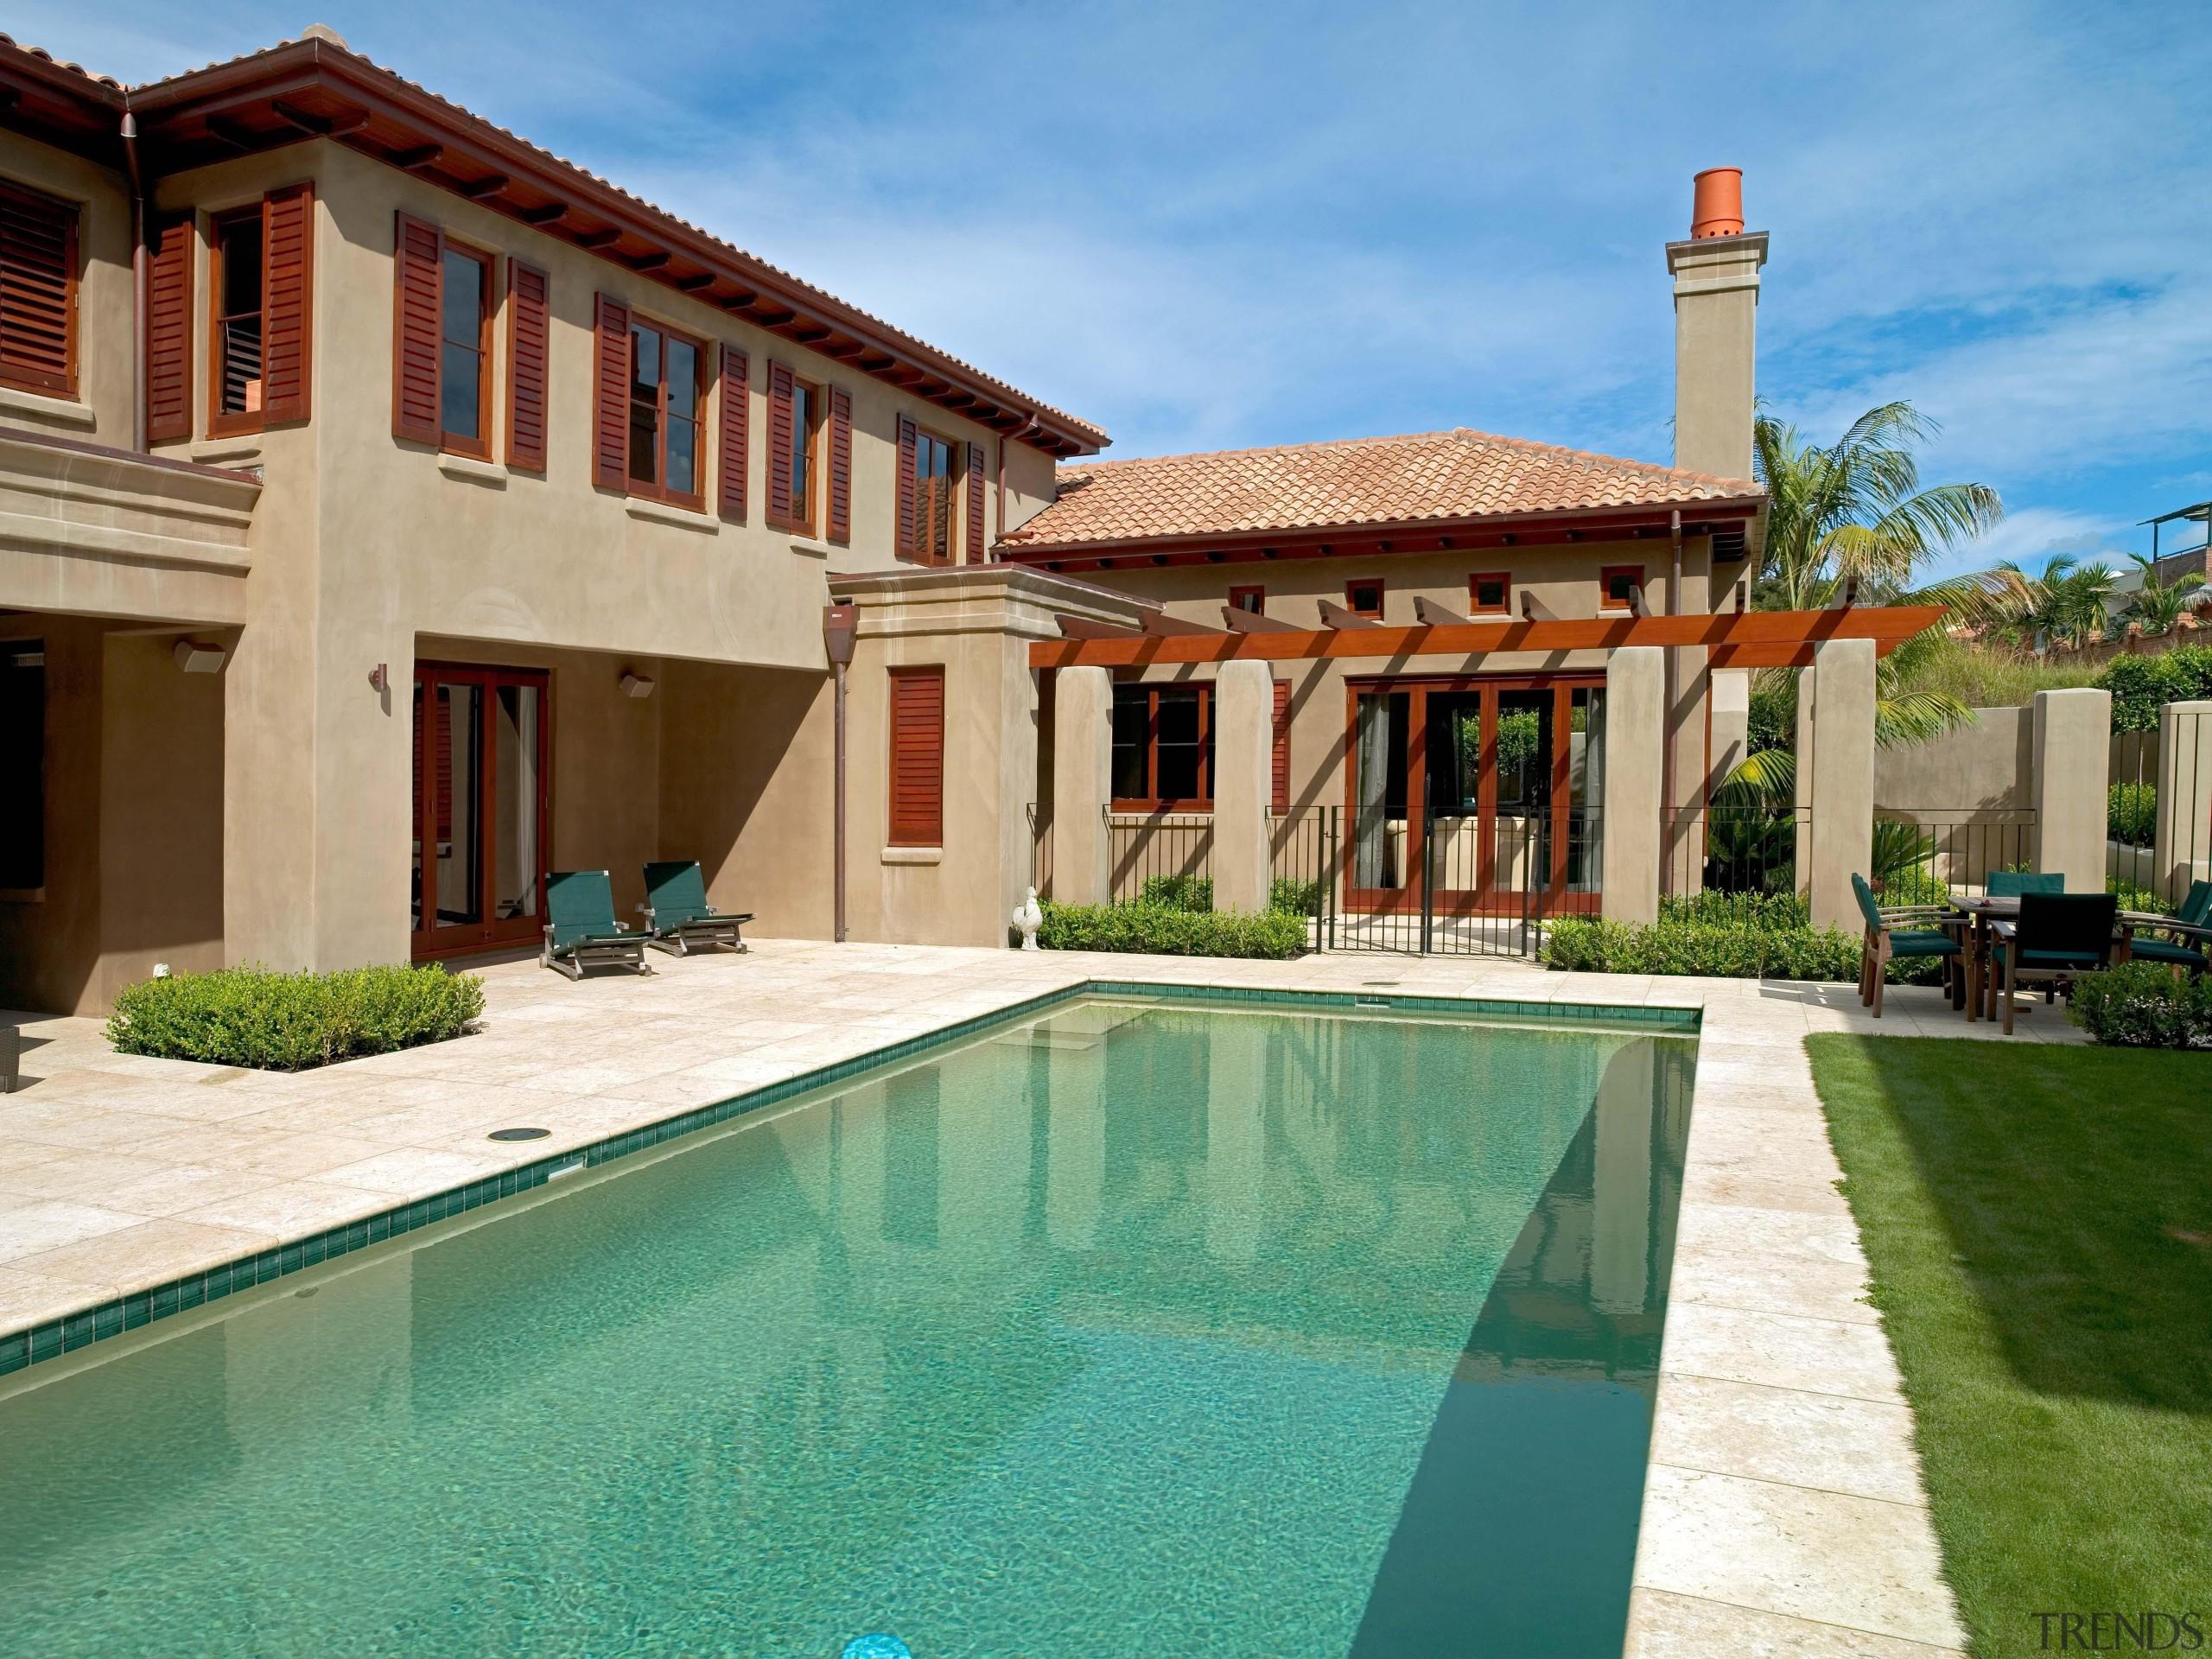 139 Onetaunga 24 - Onetaunga 24 - estate estate, hacienda, home, house, leisure, mansion, property, real estate, resort, swimming pool, villa, teal